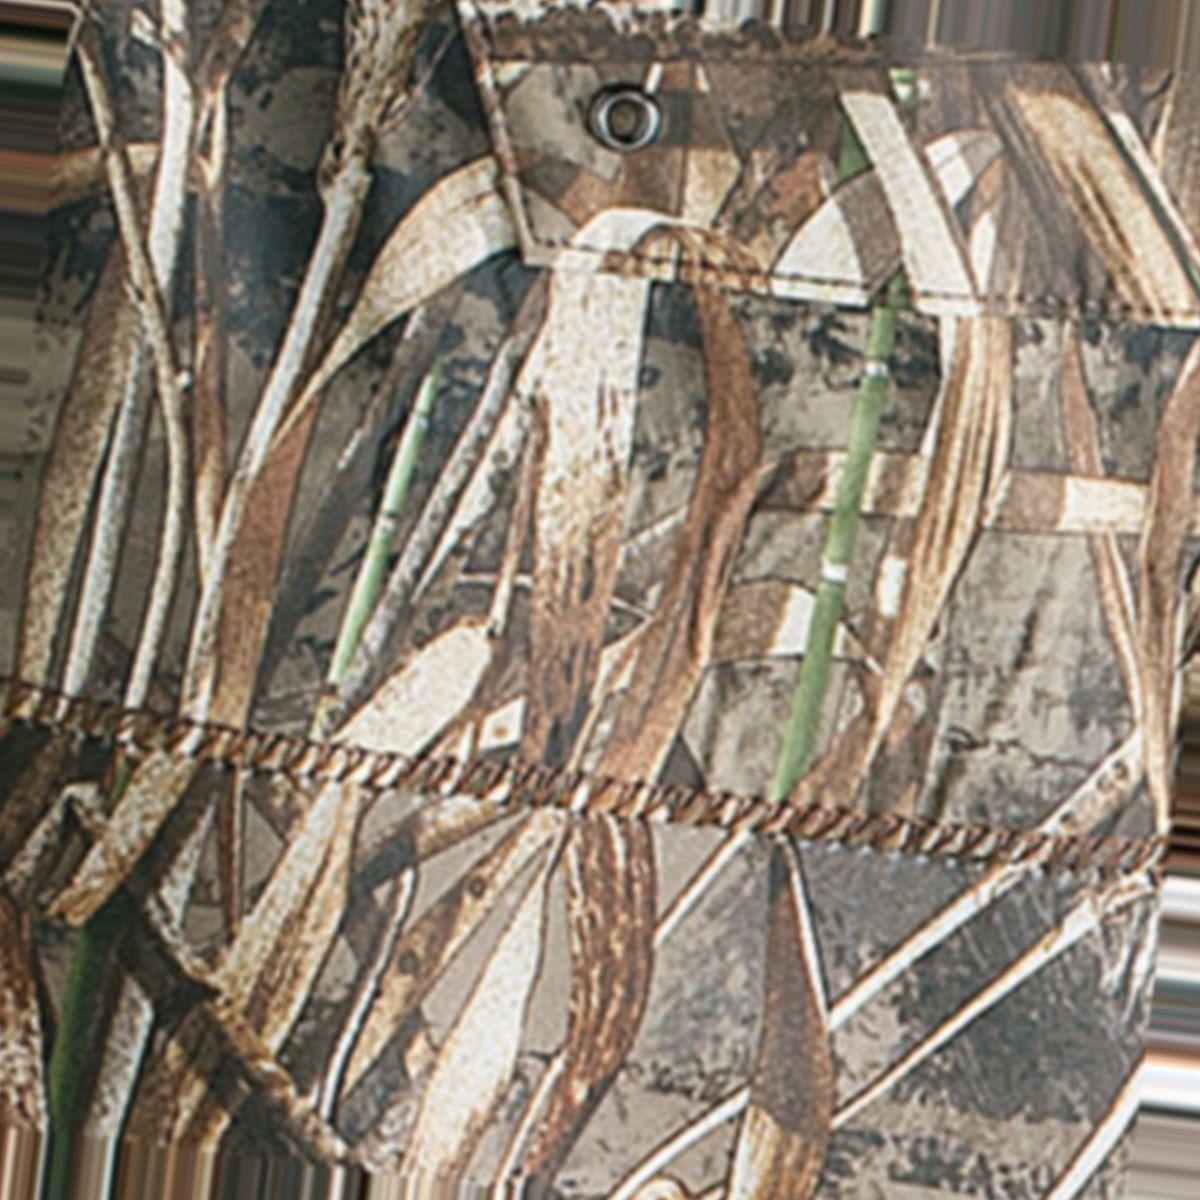 Caddis Youth NeoBreathable Hybrid Waders